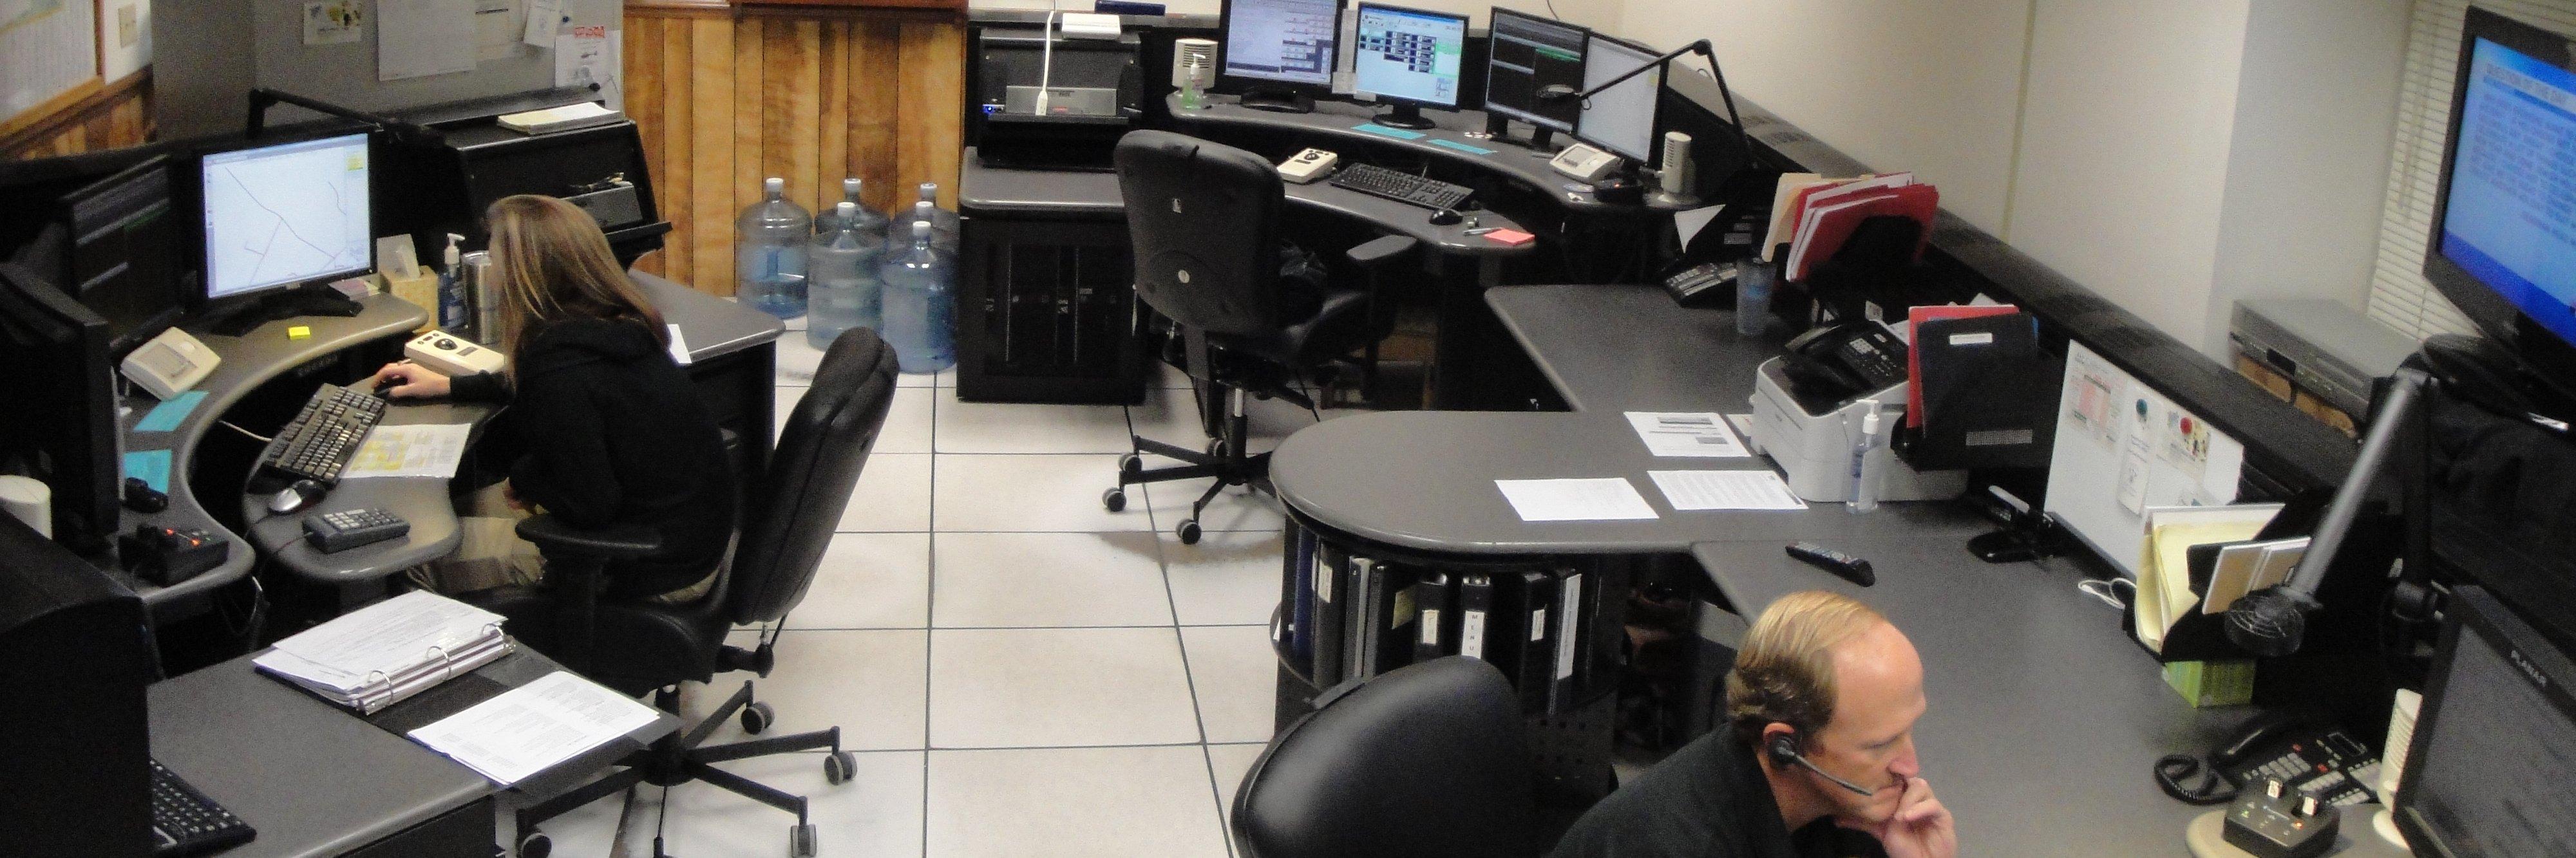 Dispatch Center – Communications